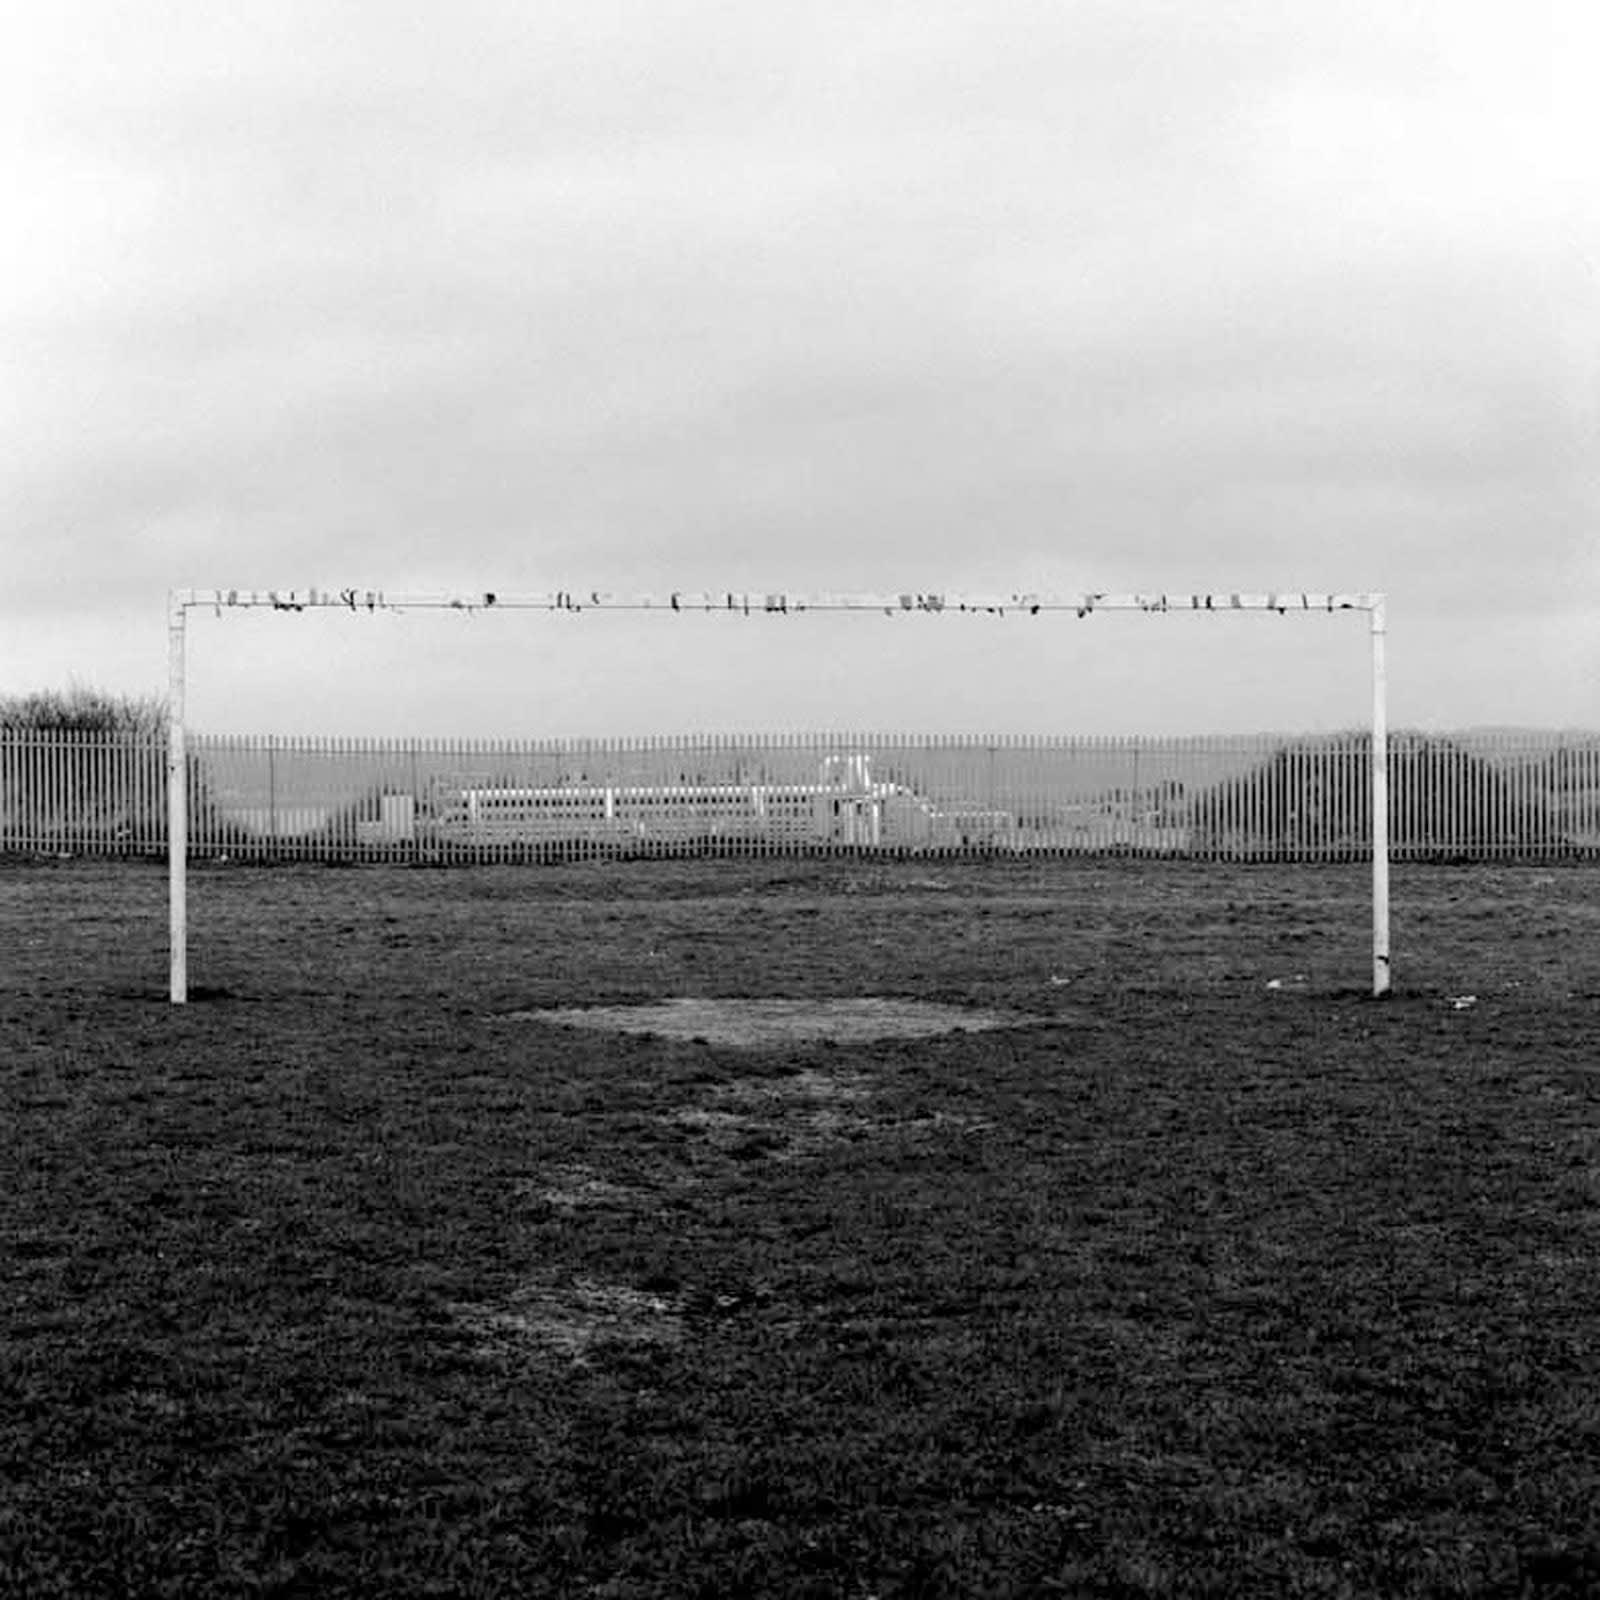 Pierre Schwartz, Birkenhead, Angleterre, 2008